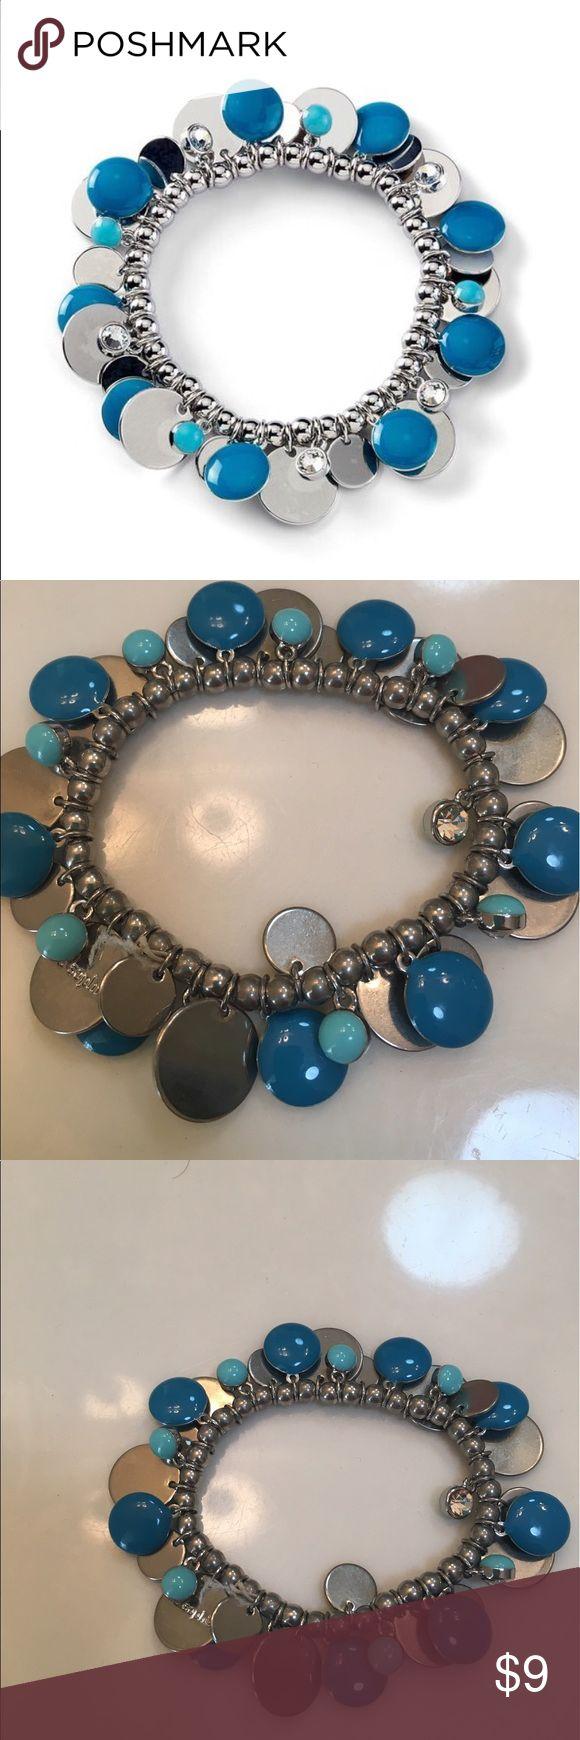 Lia Sophia bracelet Very pretty Lia Sophia bracelet (costume jewelry) with turquoise and silver. Lia Sophia Jewelry Bracelets